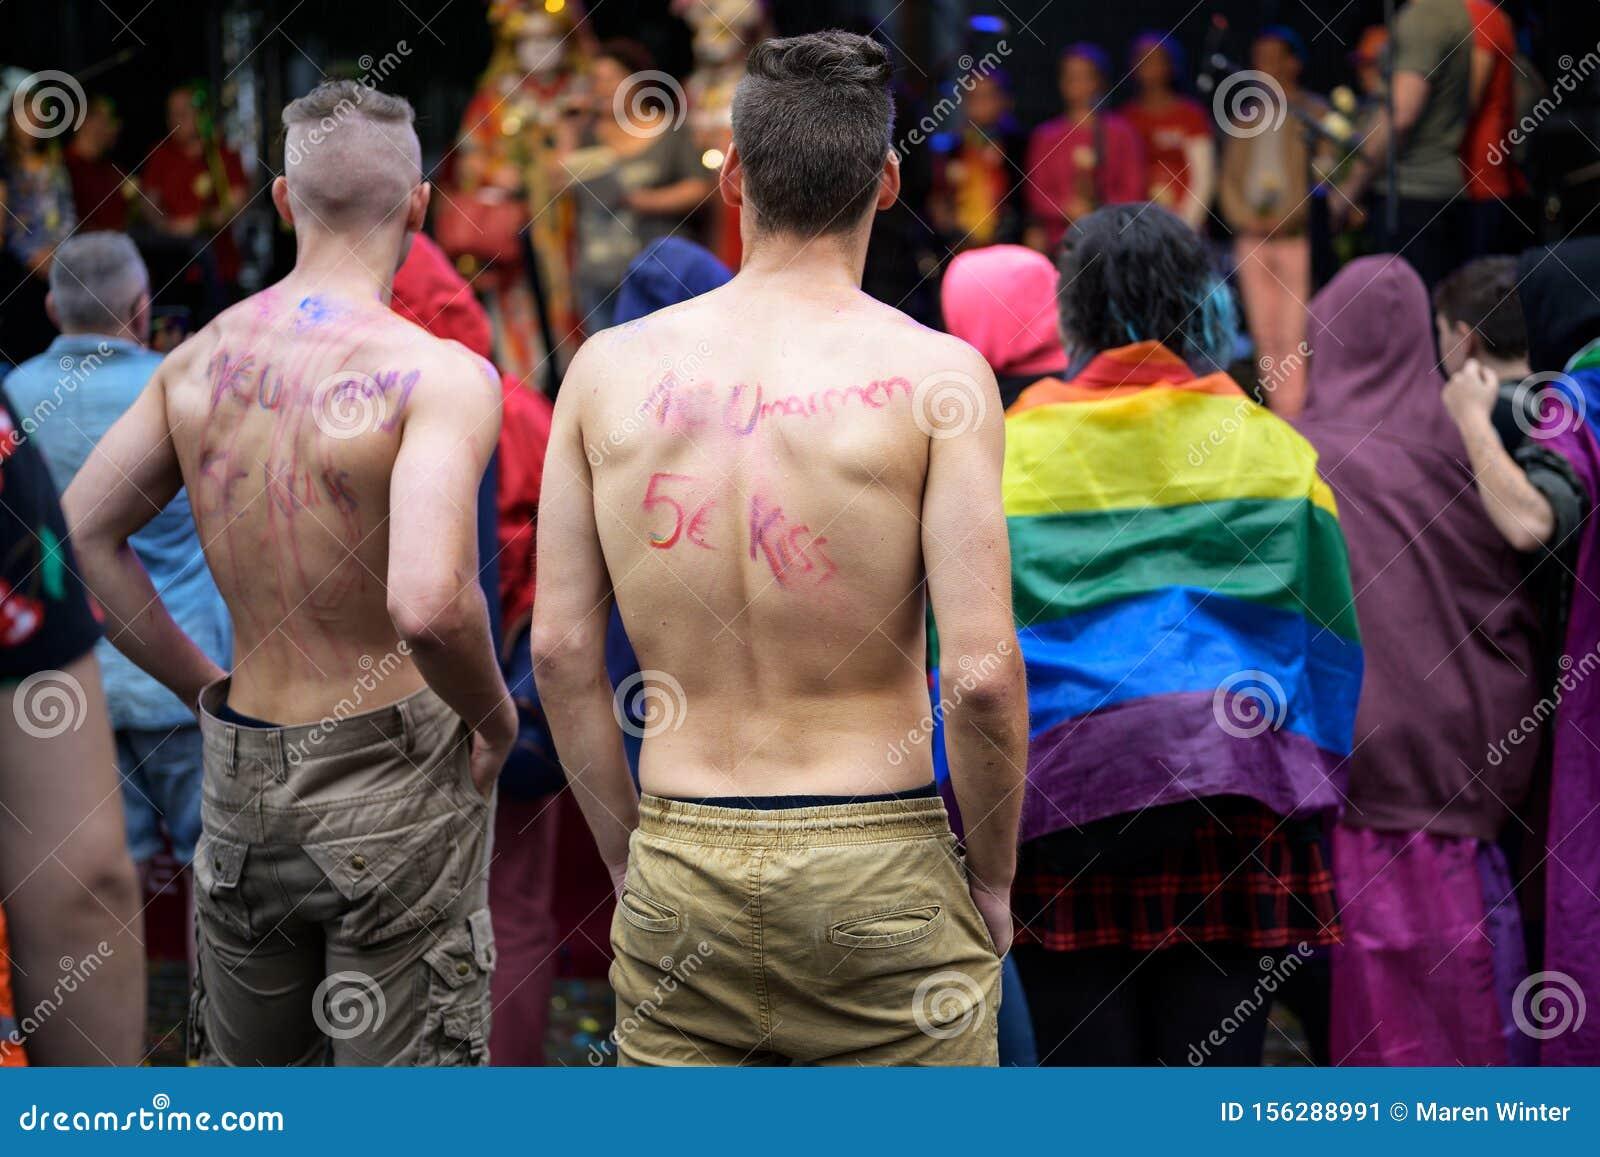 Gay lübeck Europe :